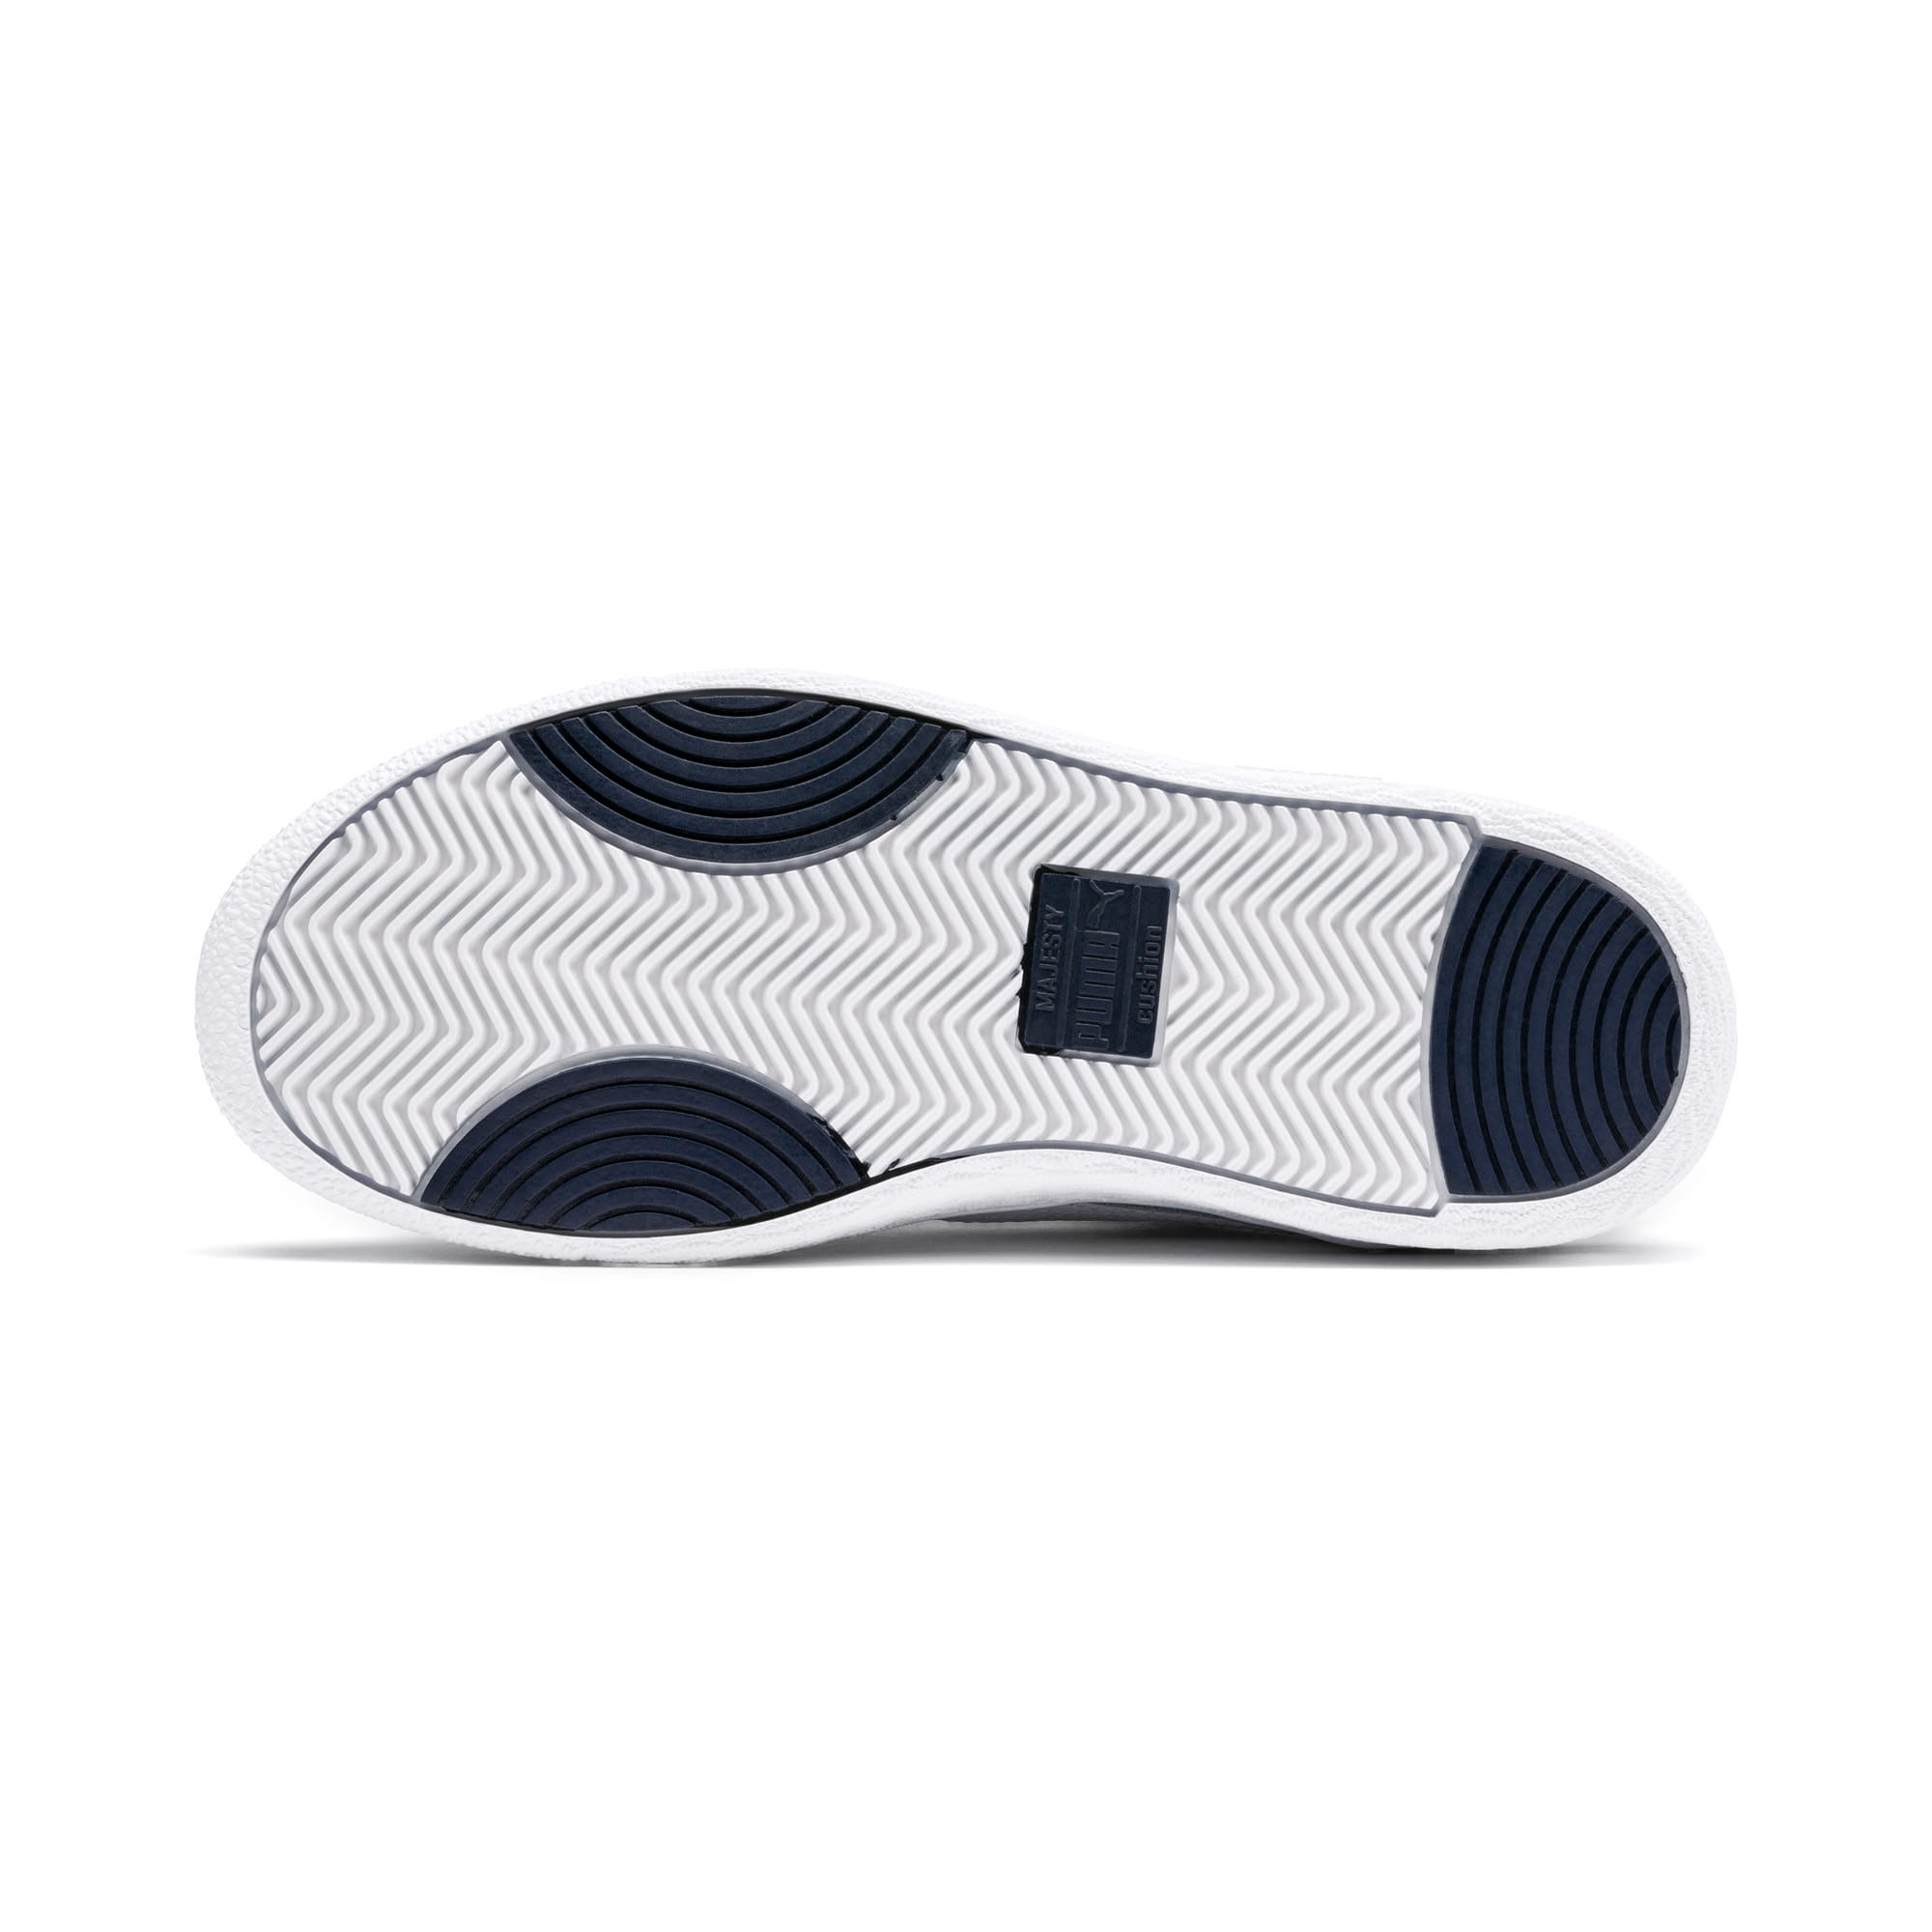 Thumbnail 4 of Ralph Sampson Lo Sneakers JR, White-Peacoat-White, medium